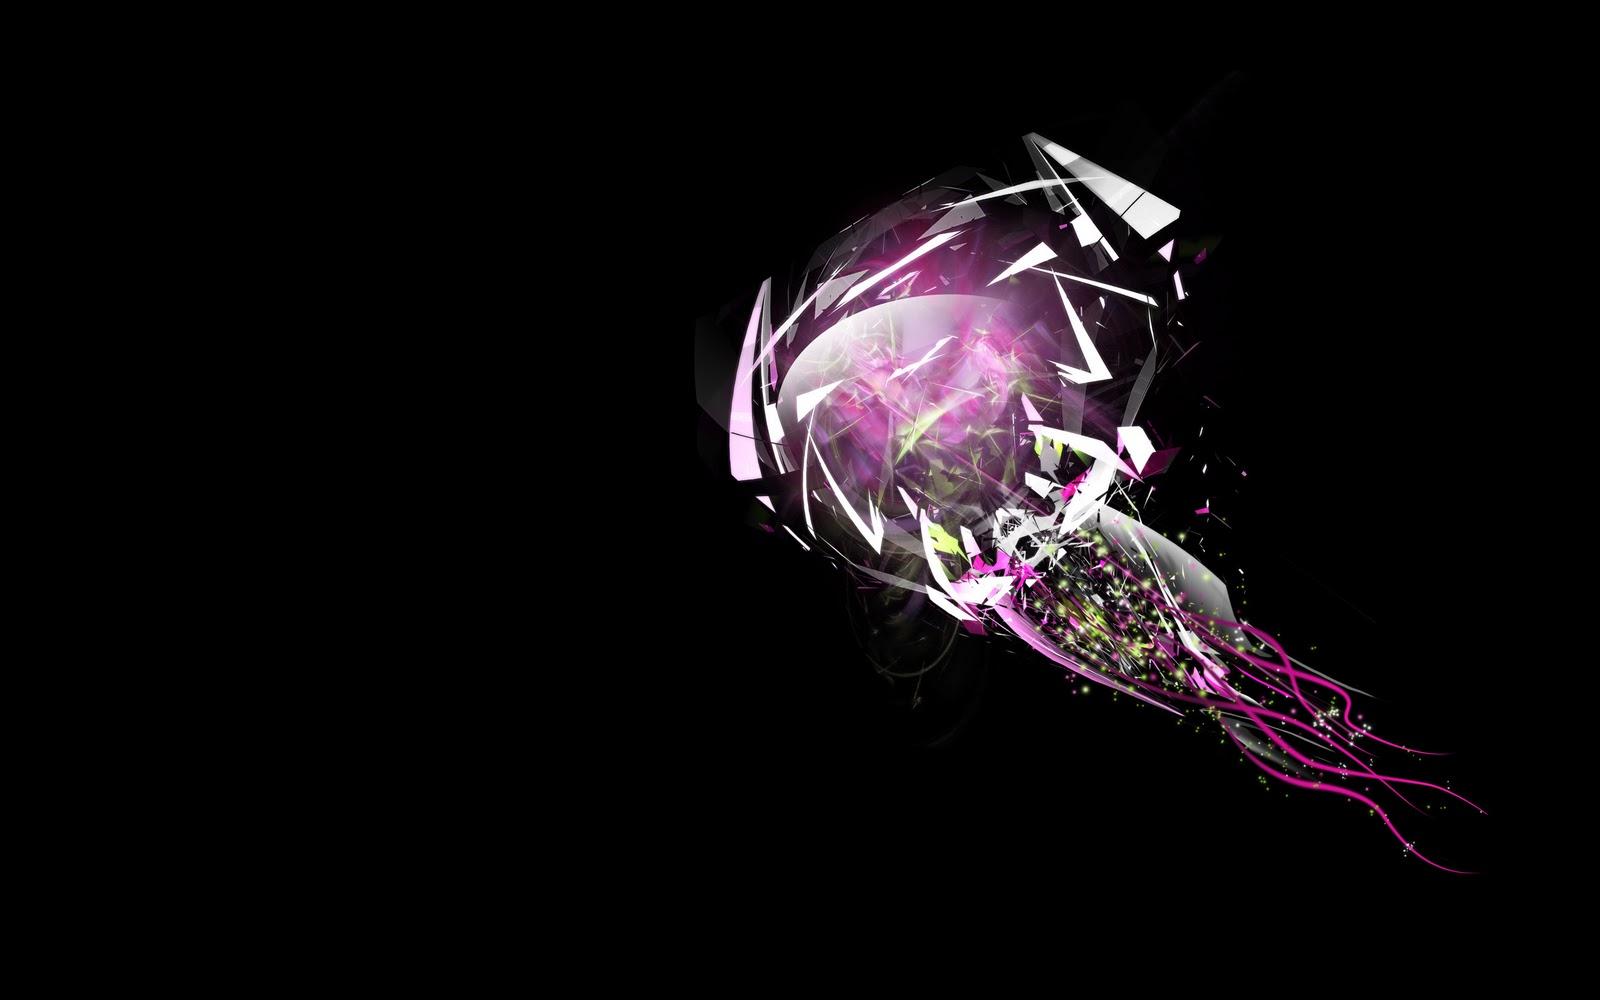 Abstract purple digital diamond hd wallpaper The Wallpaper Database 1600x1000